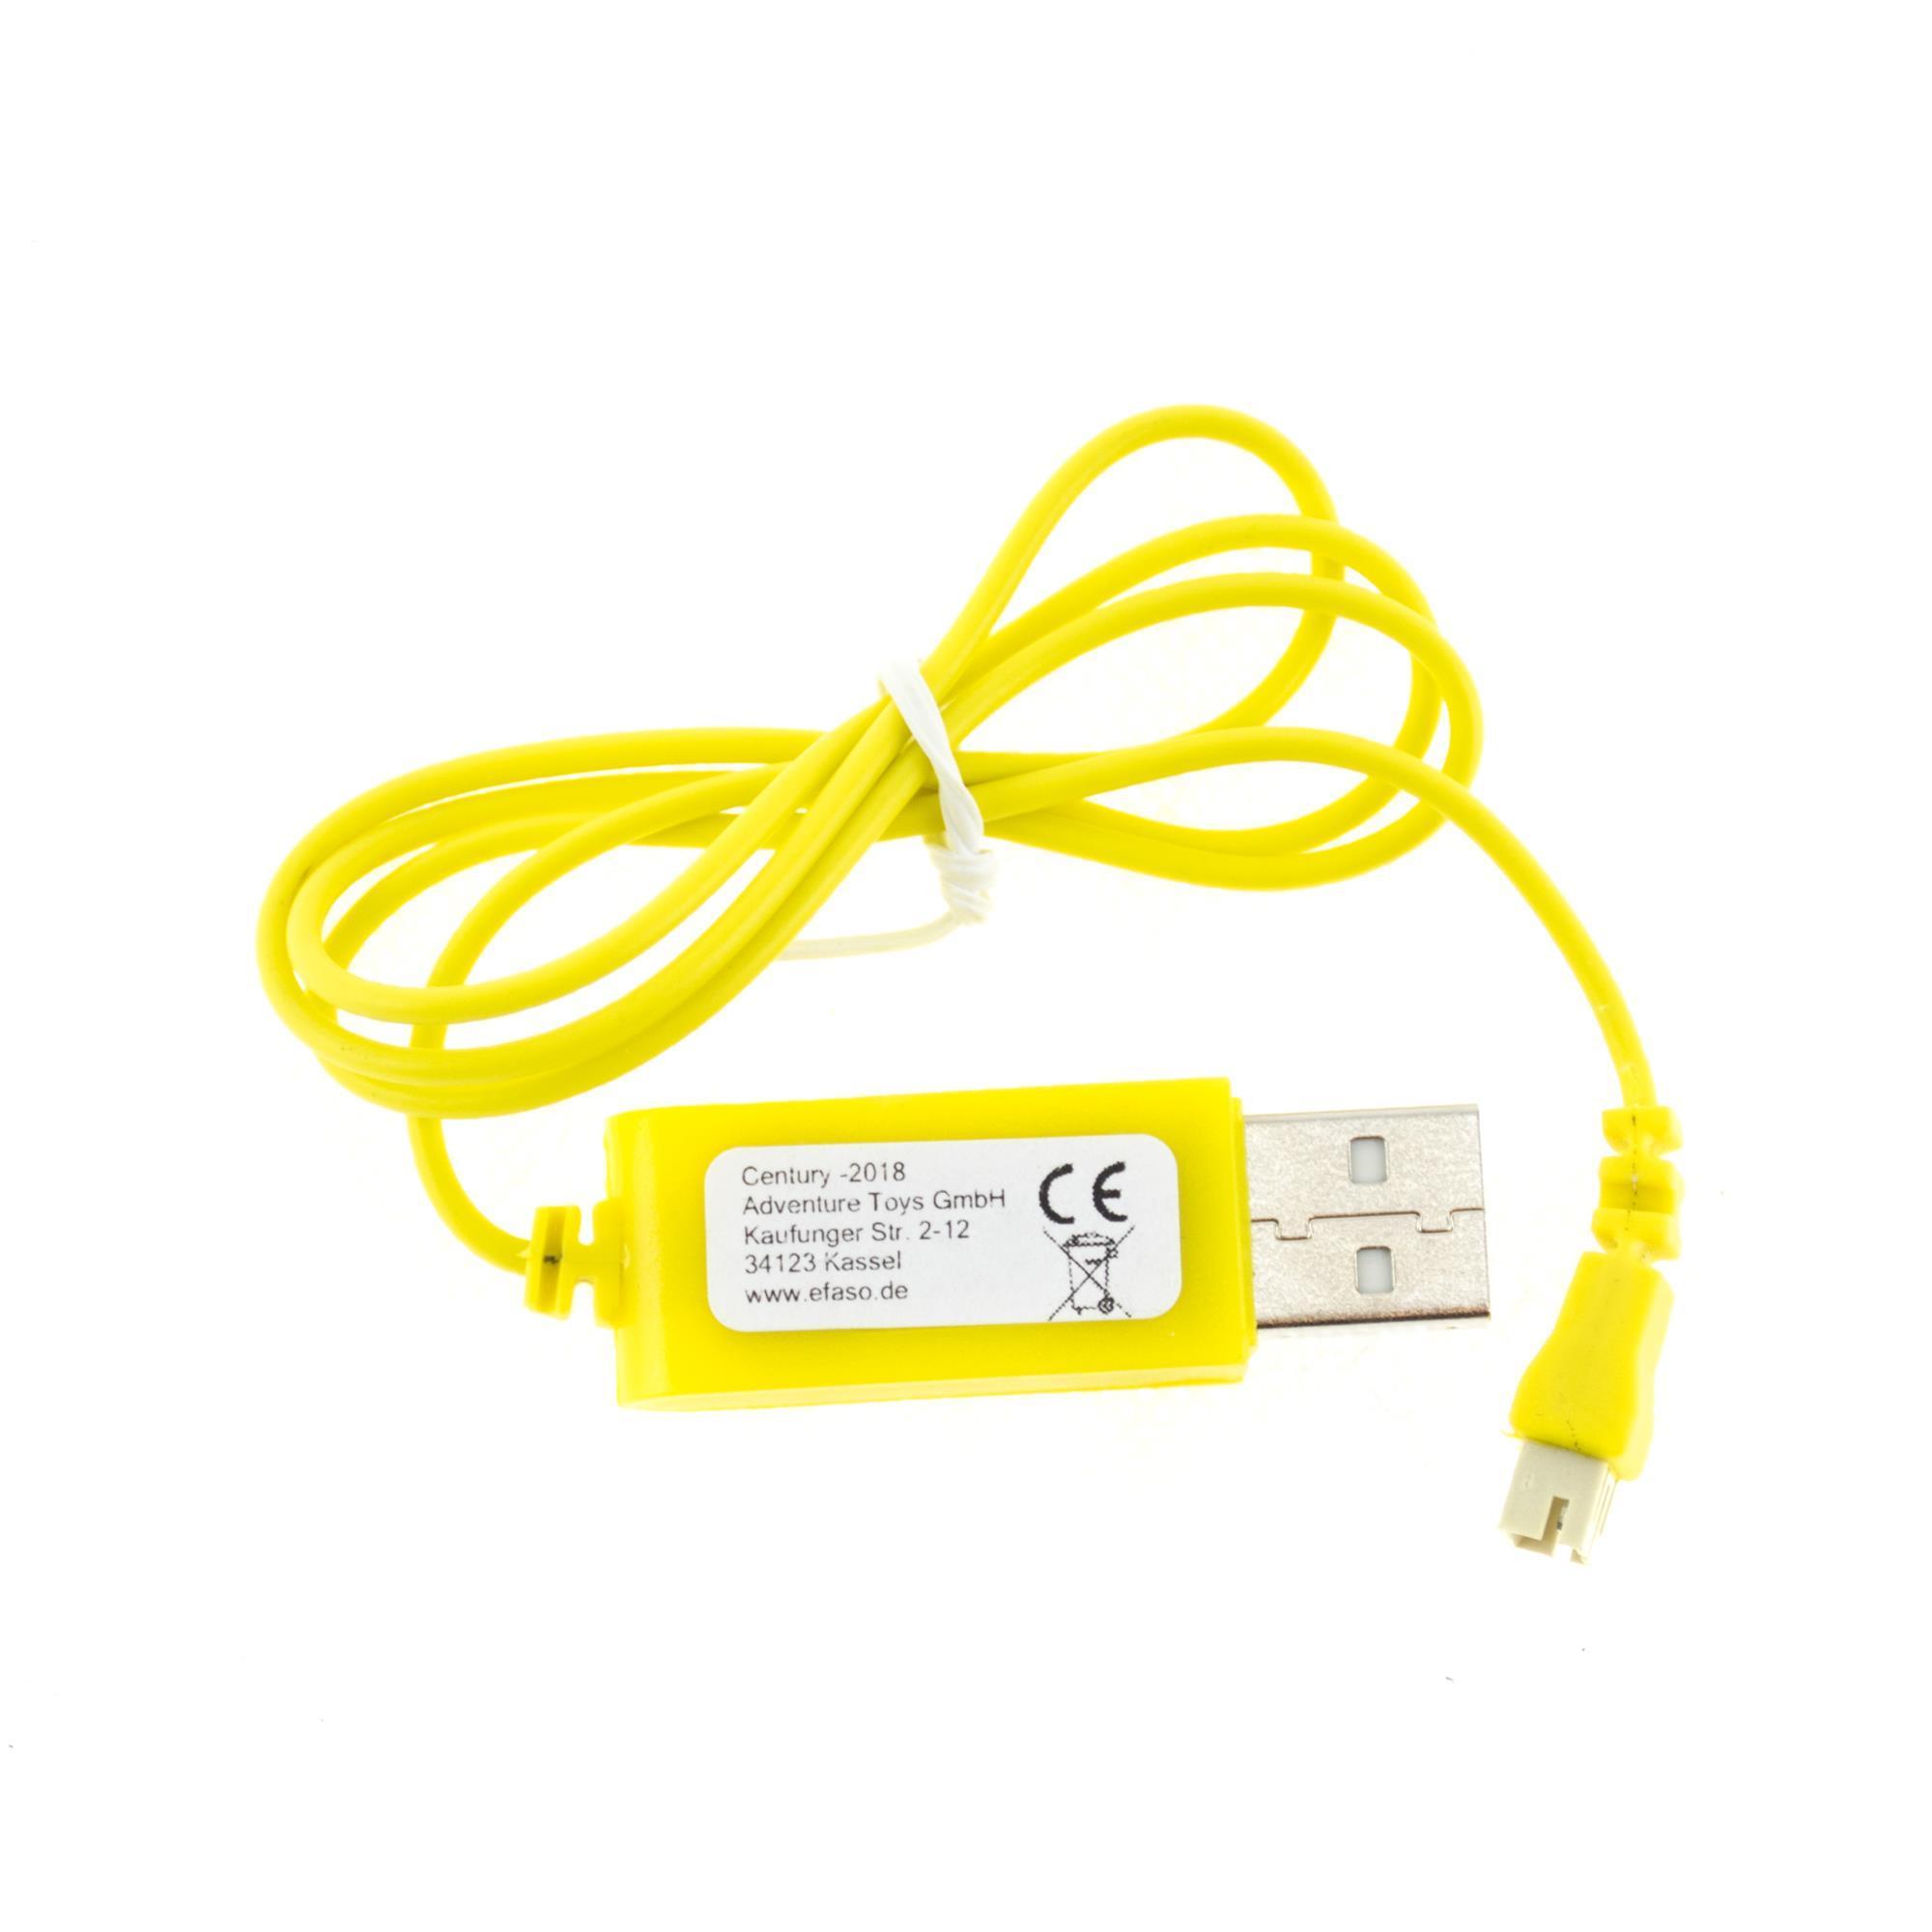 efaso Ersatzteile 7,2V USB-Kabel mit Tamiya Stecker